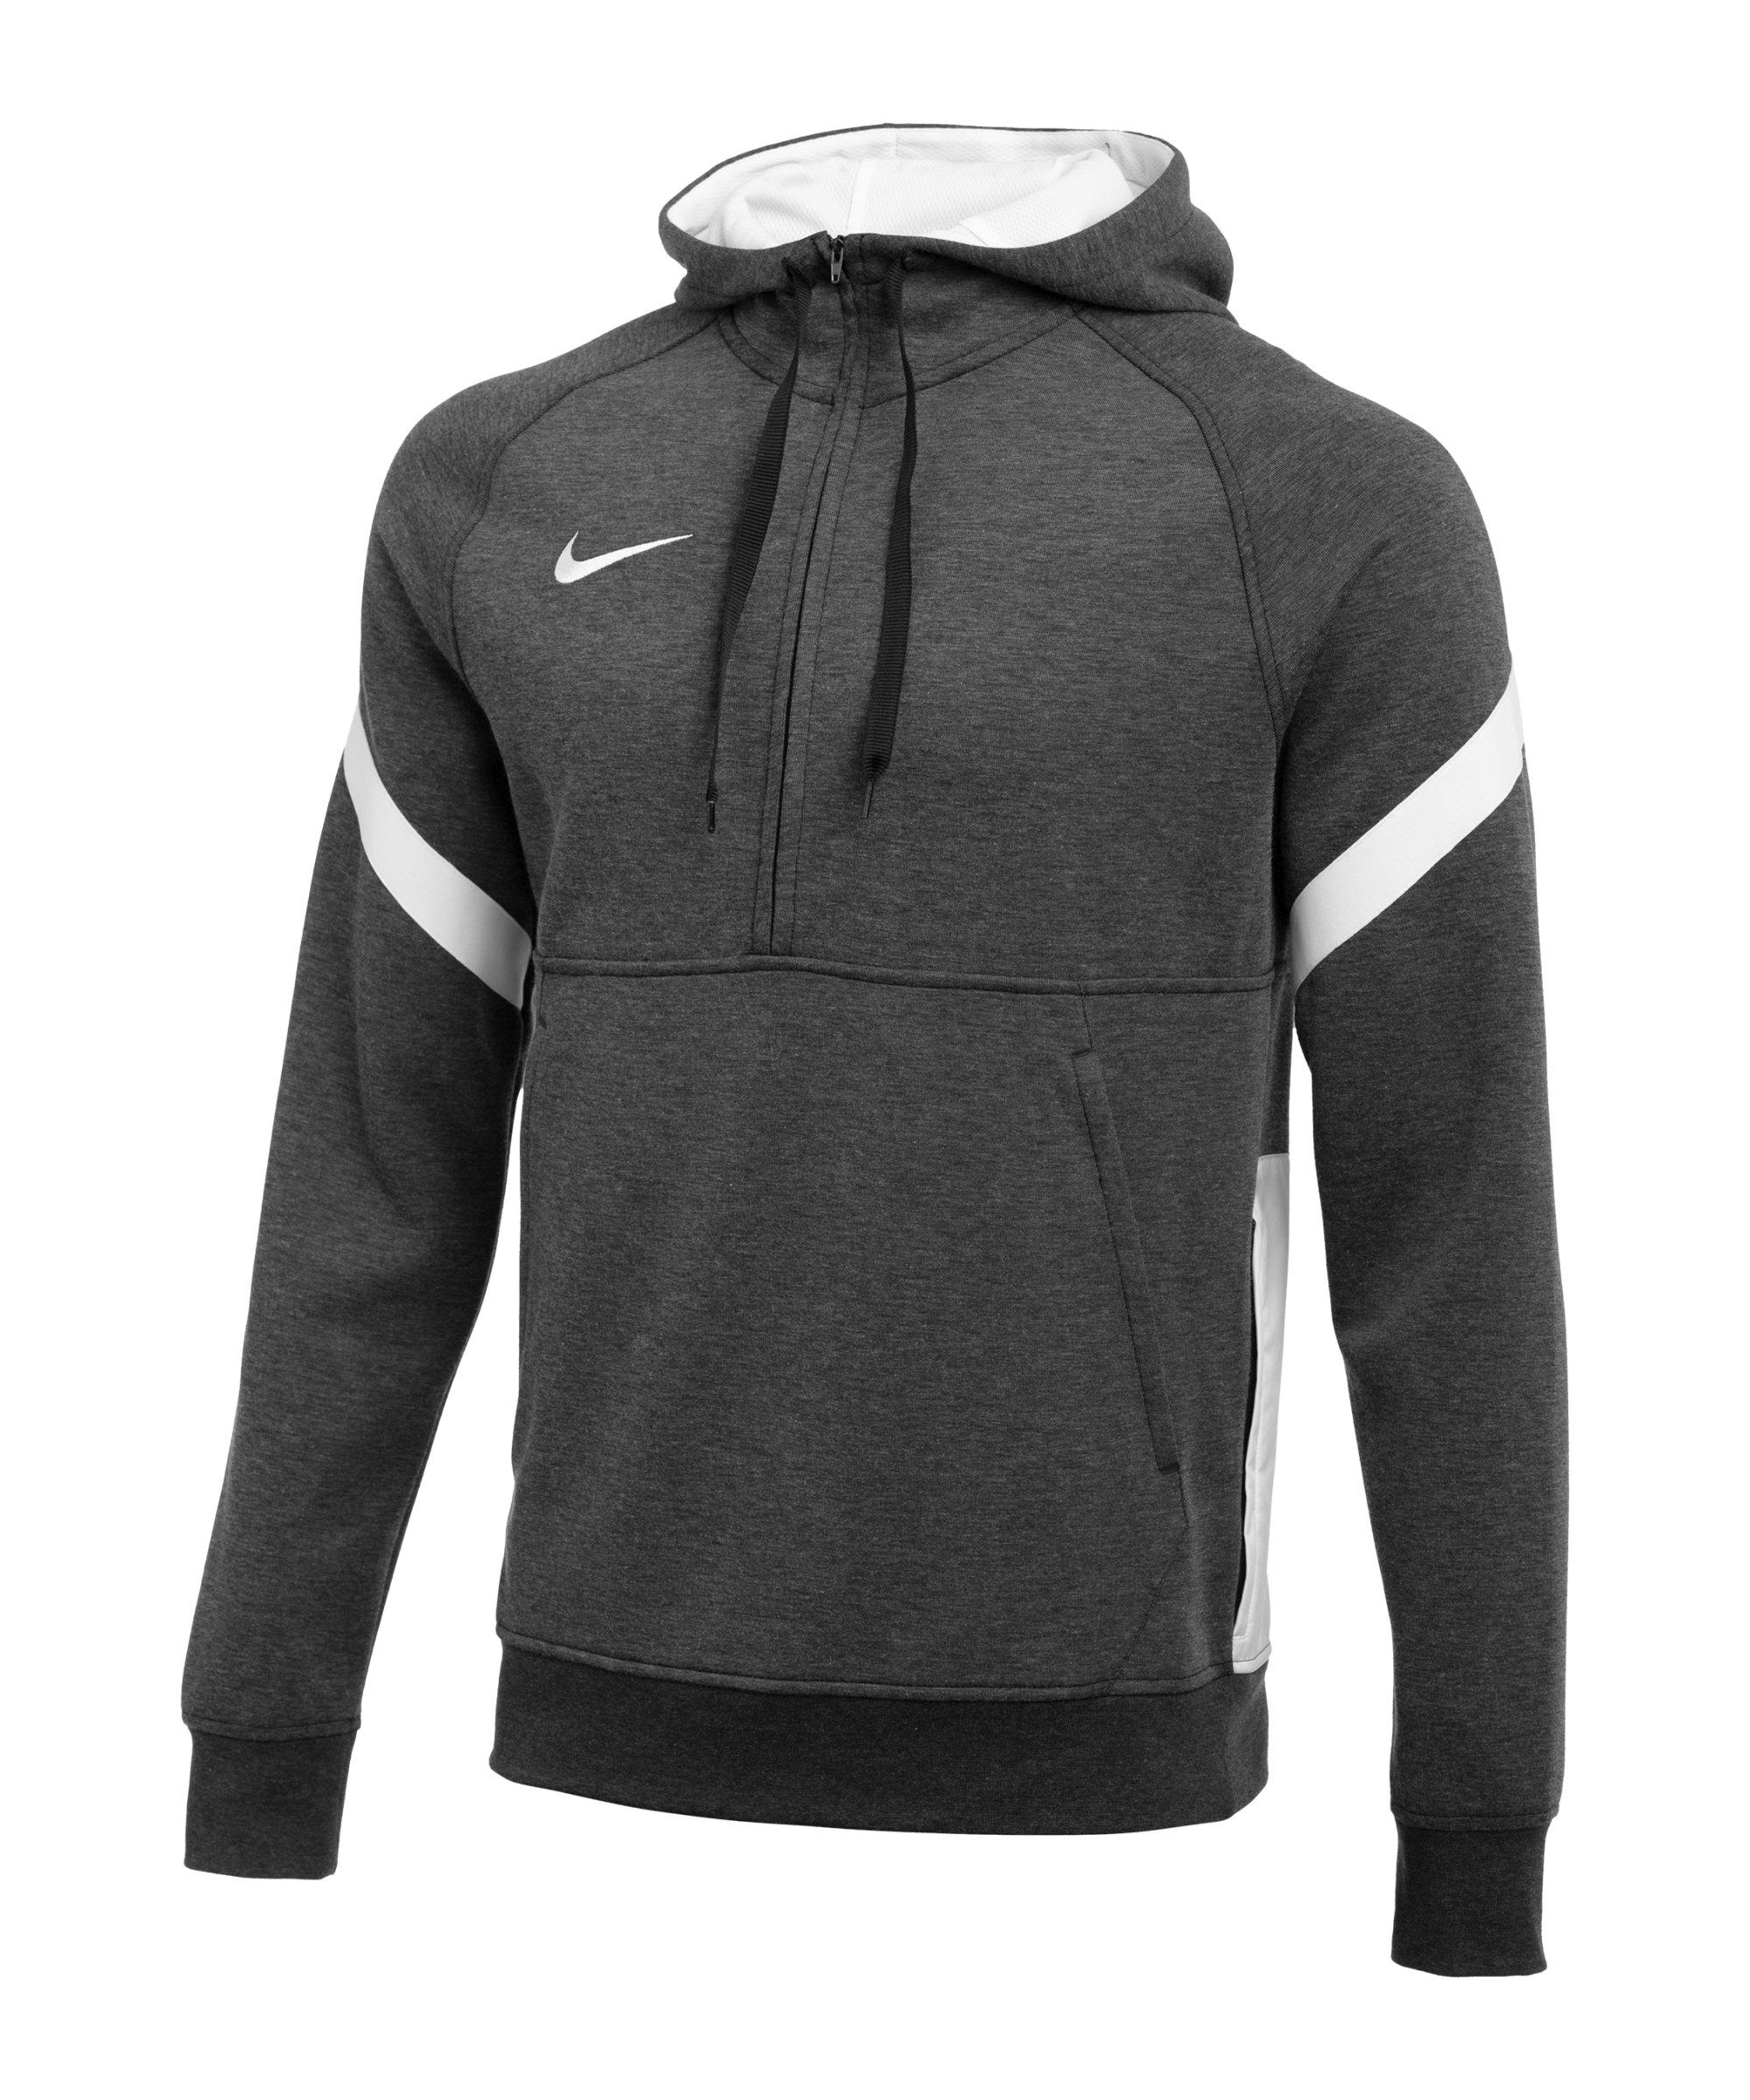 Nike Strike 21 Fleece HalfZip Hoody Schwarz F011 - grau